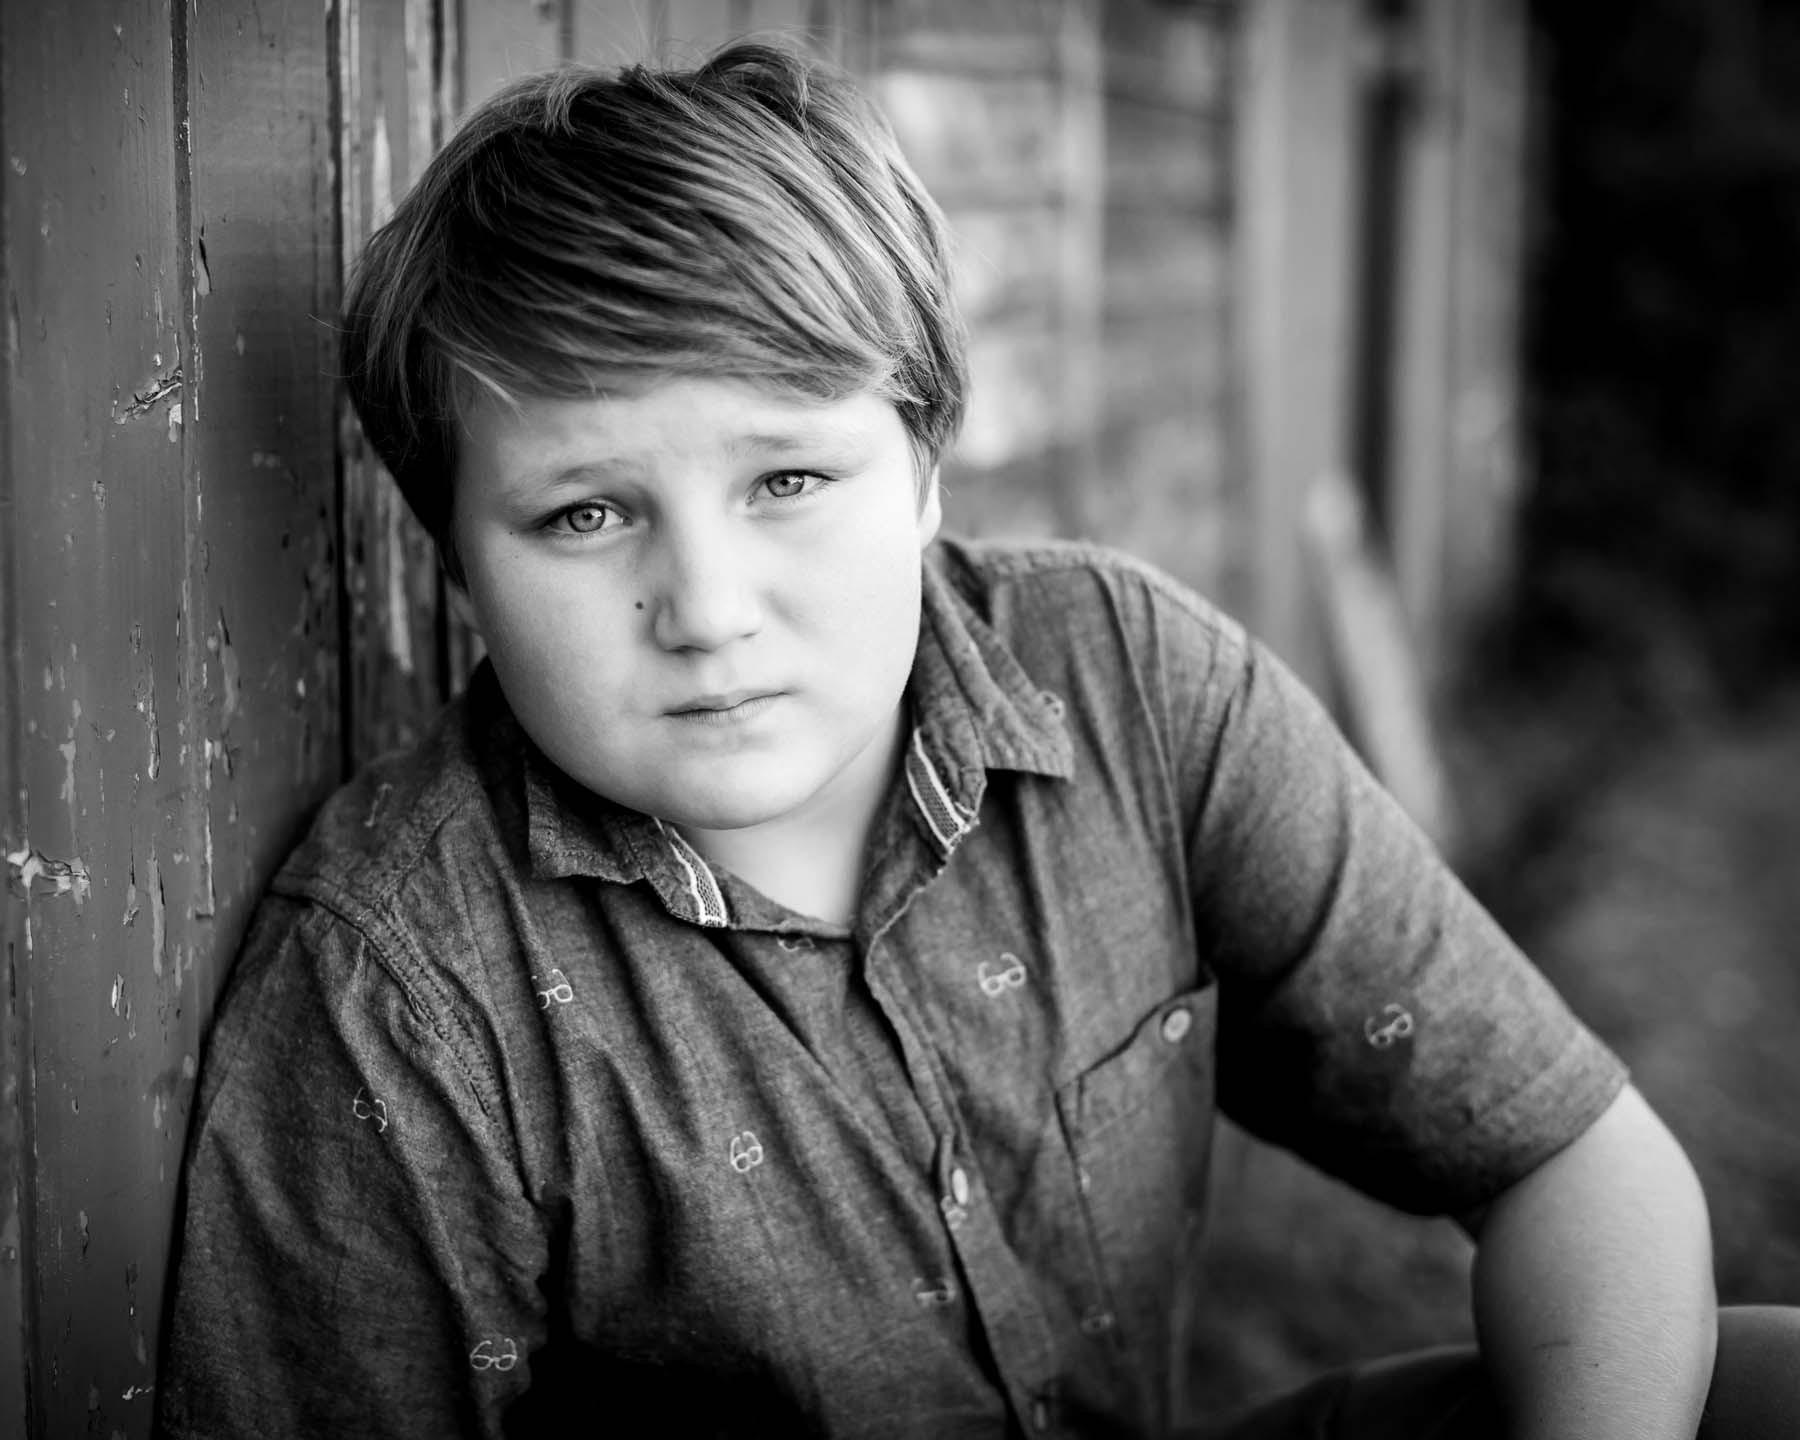 Child Photographer in Sussex & Surrey, East Grinstead & Crawley (24)